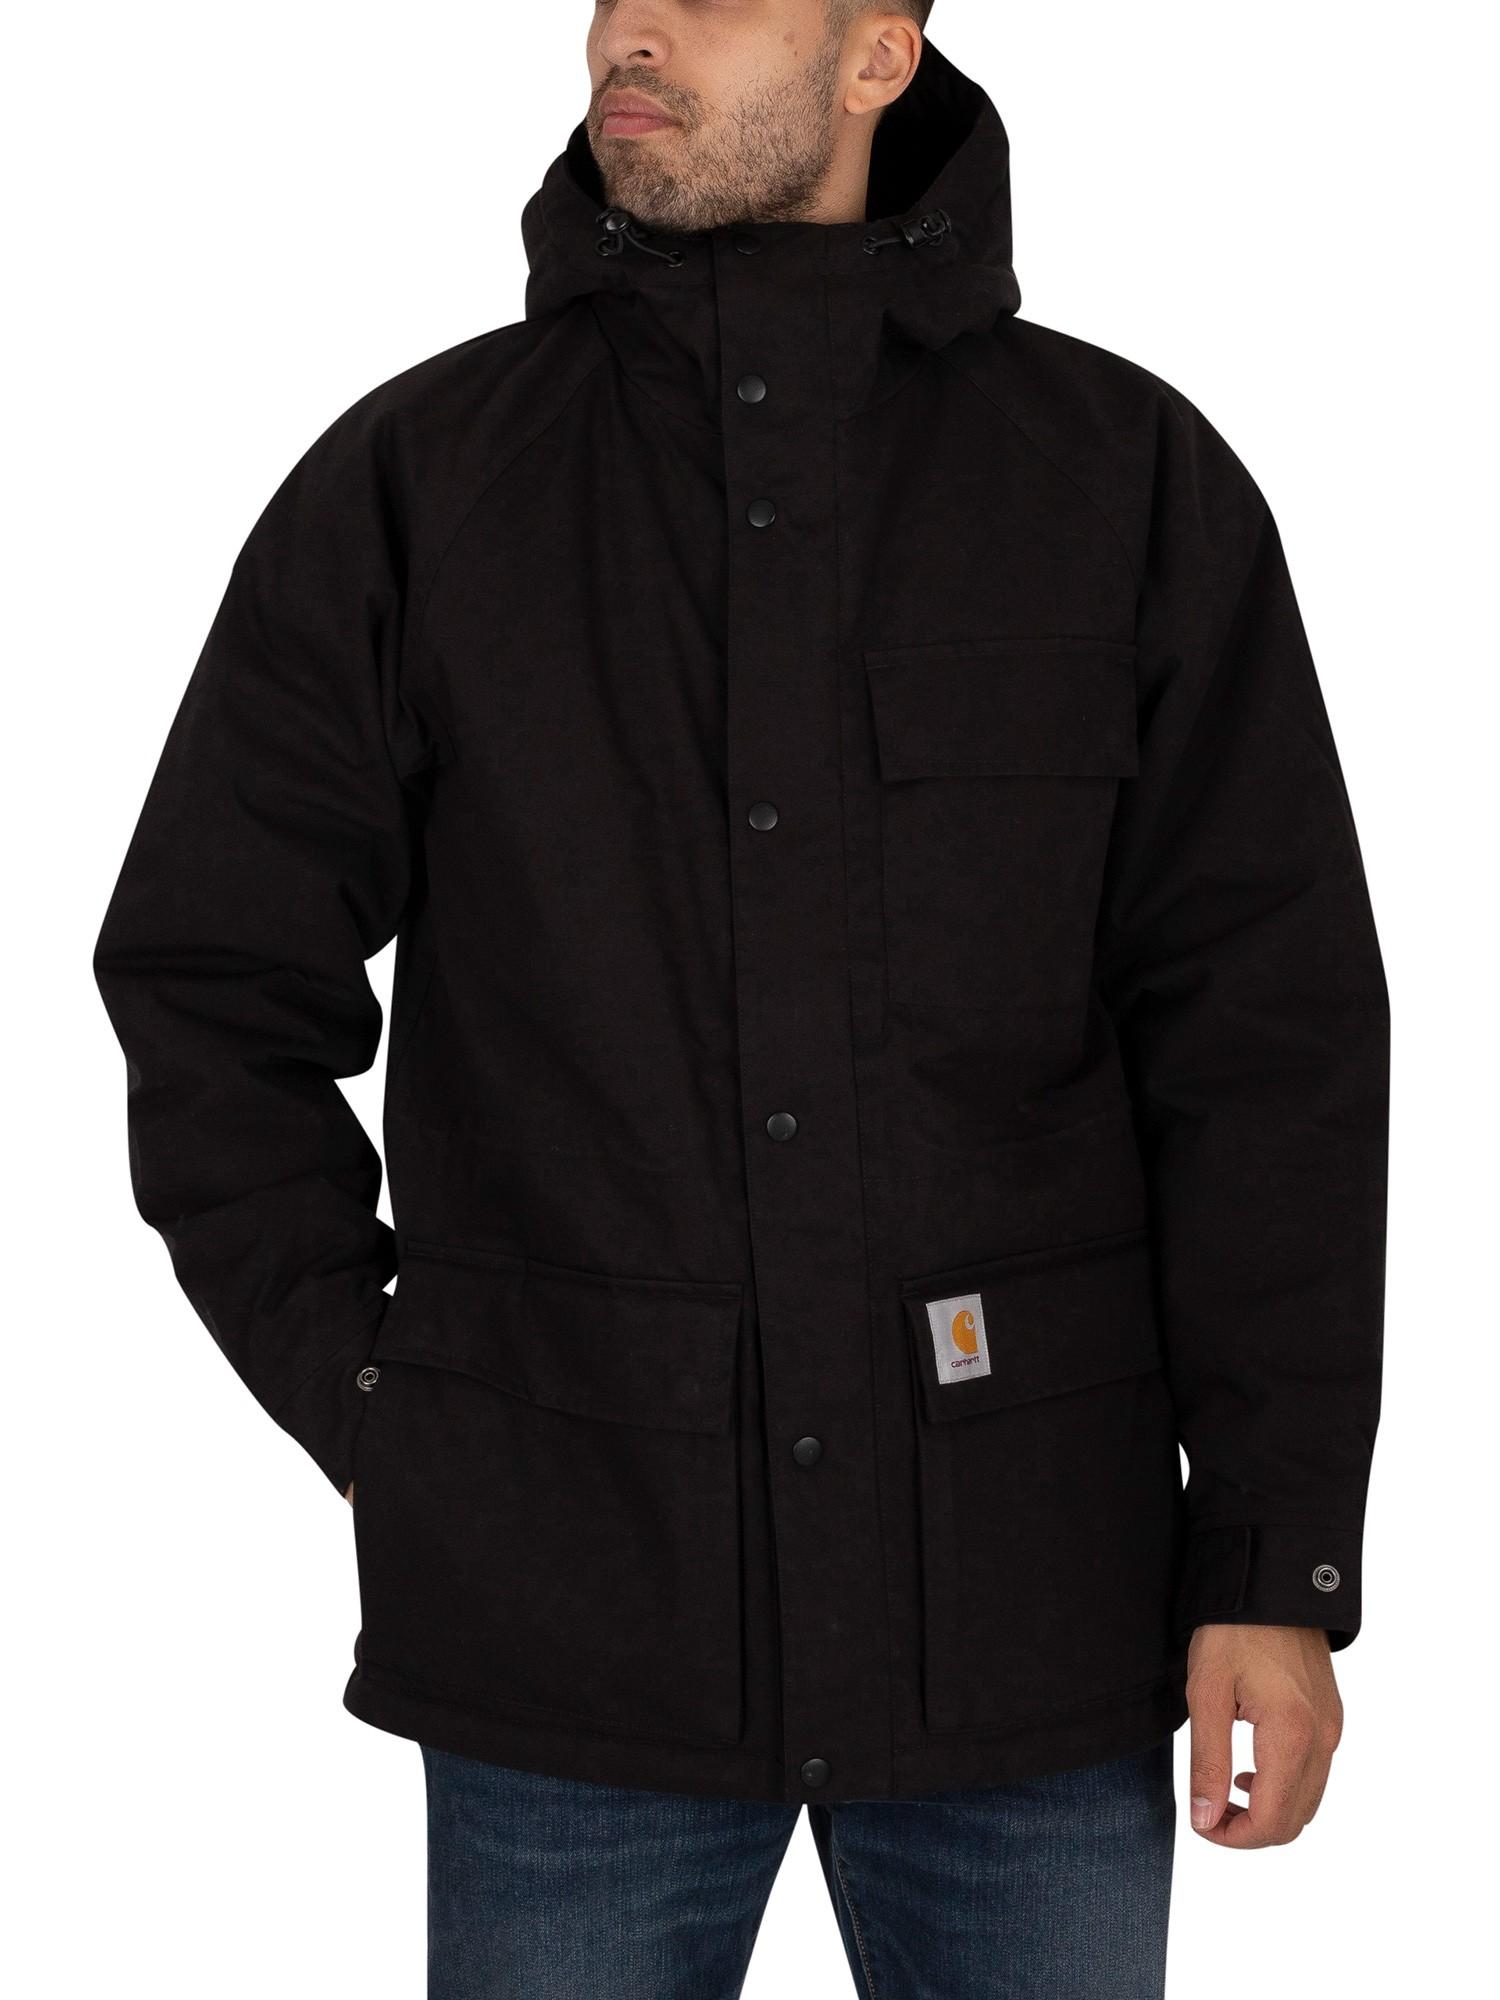 Morden-Jacket